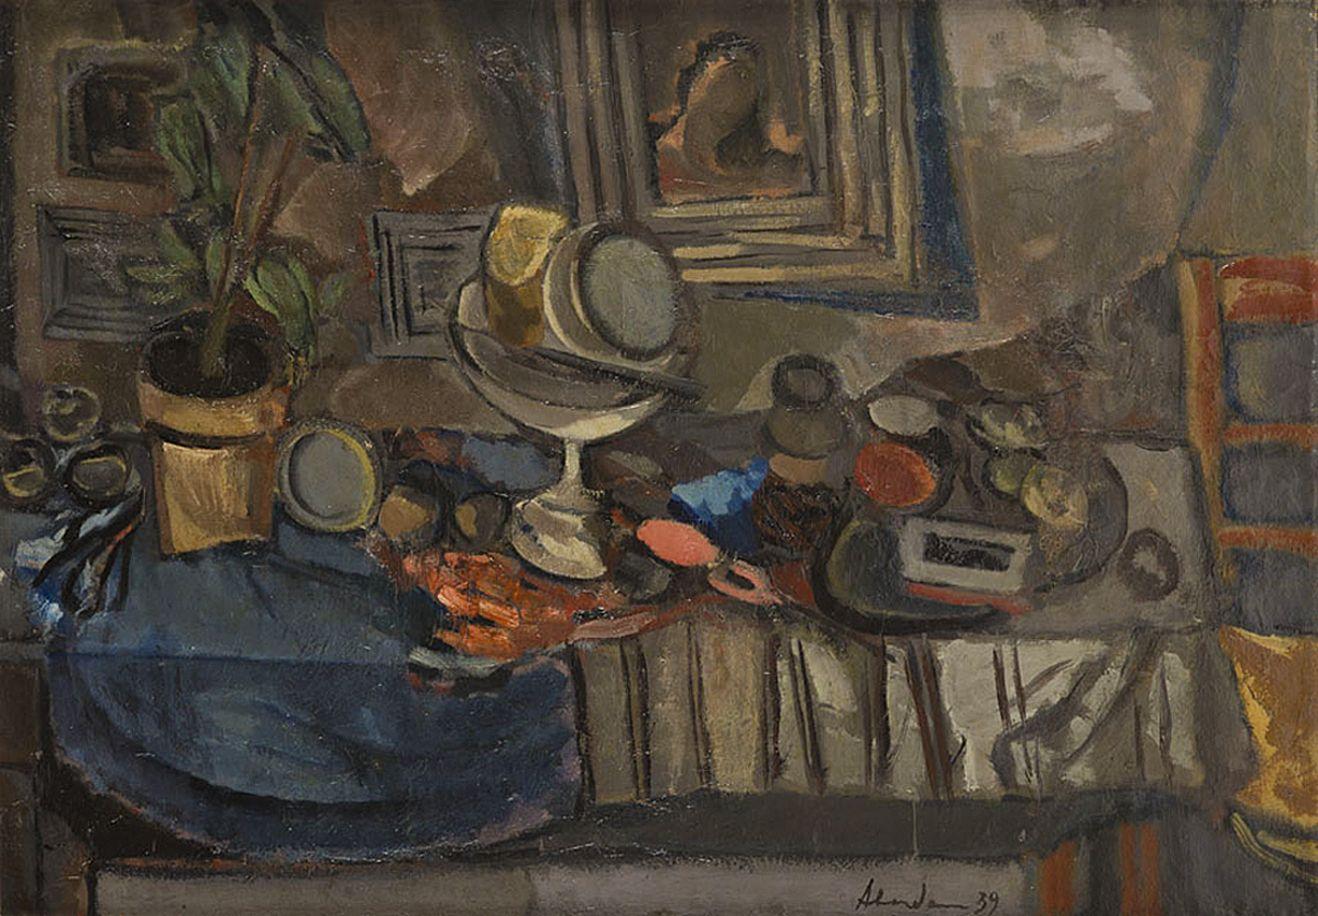 Альфред Абердам. Натюрморт, 1939